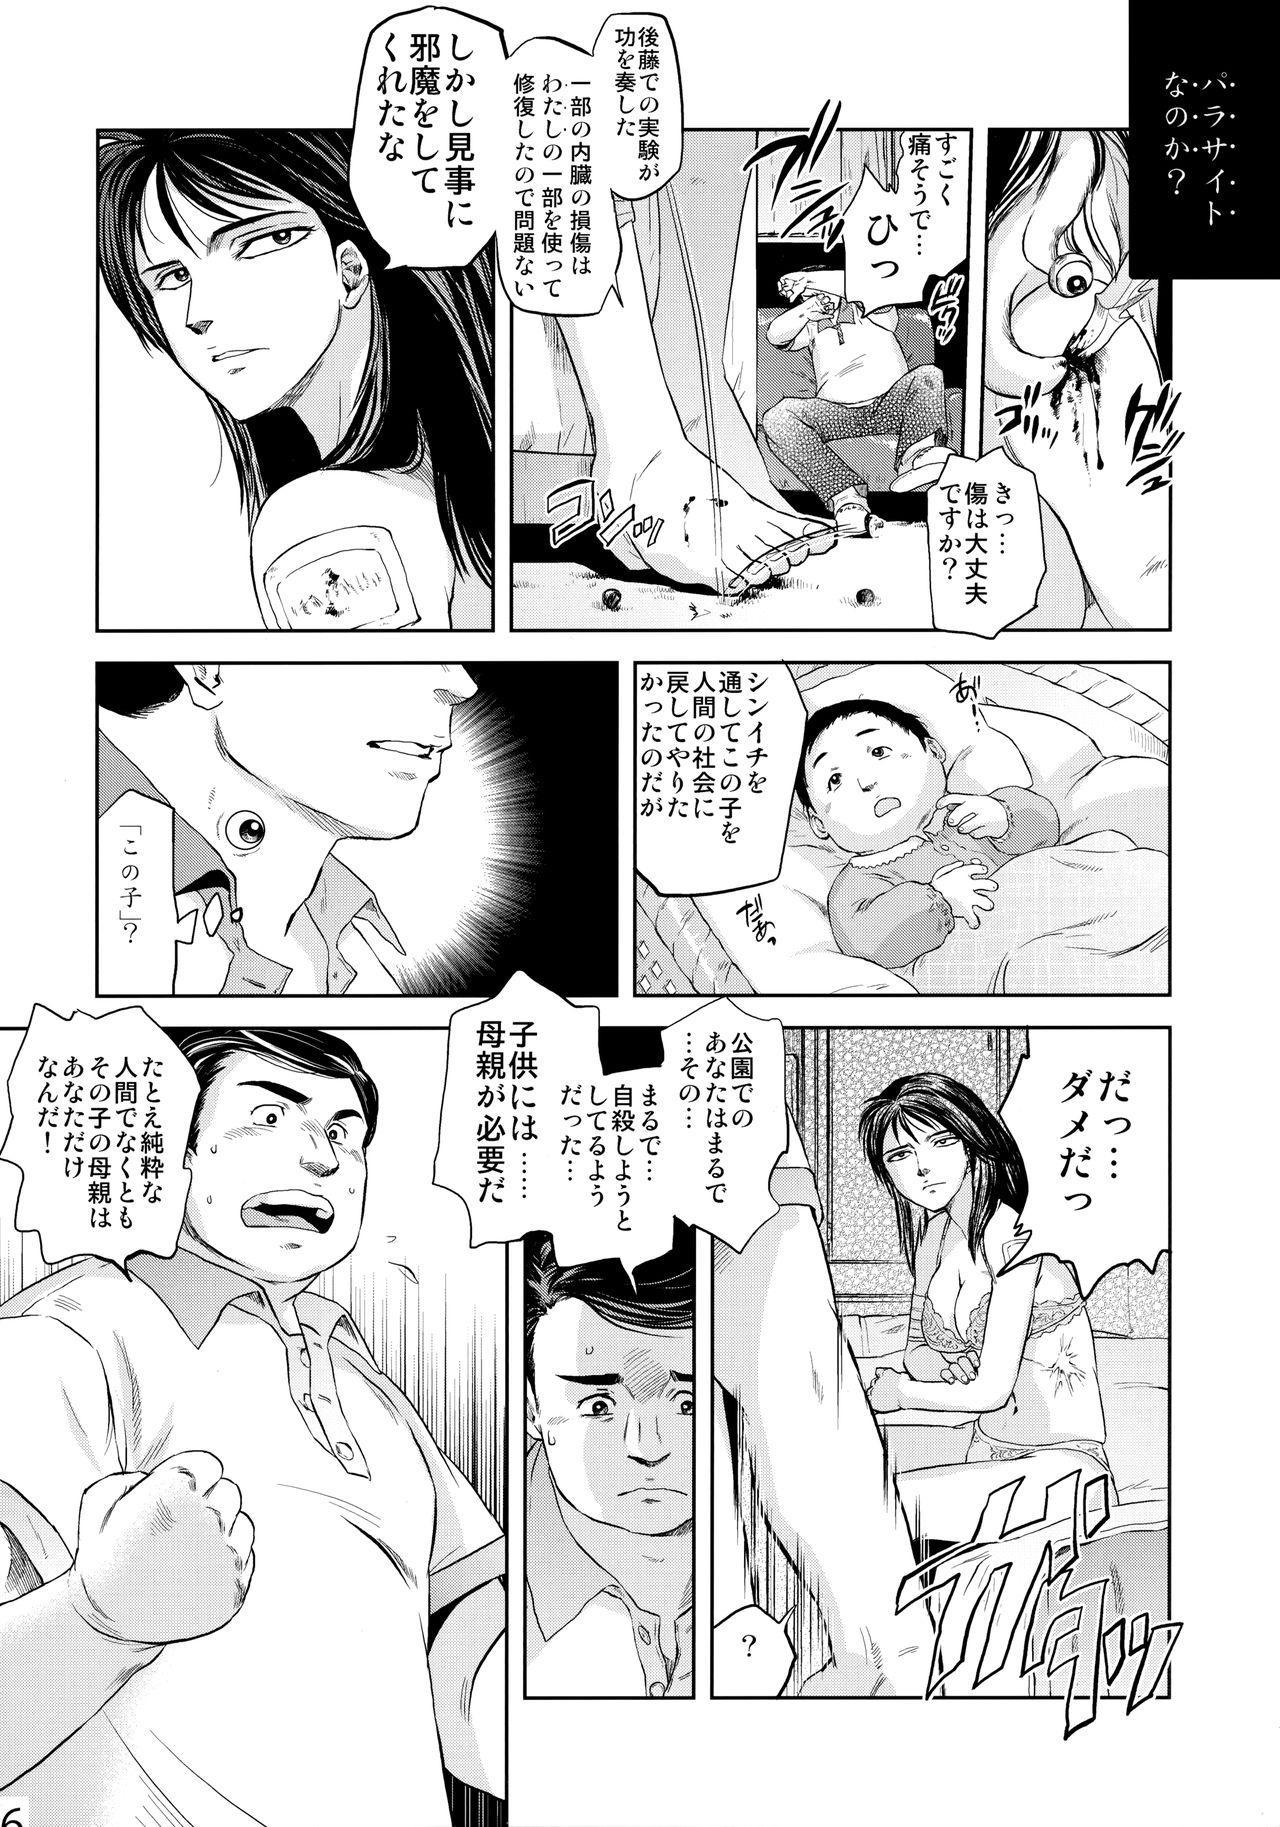 Yomeiri 34